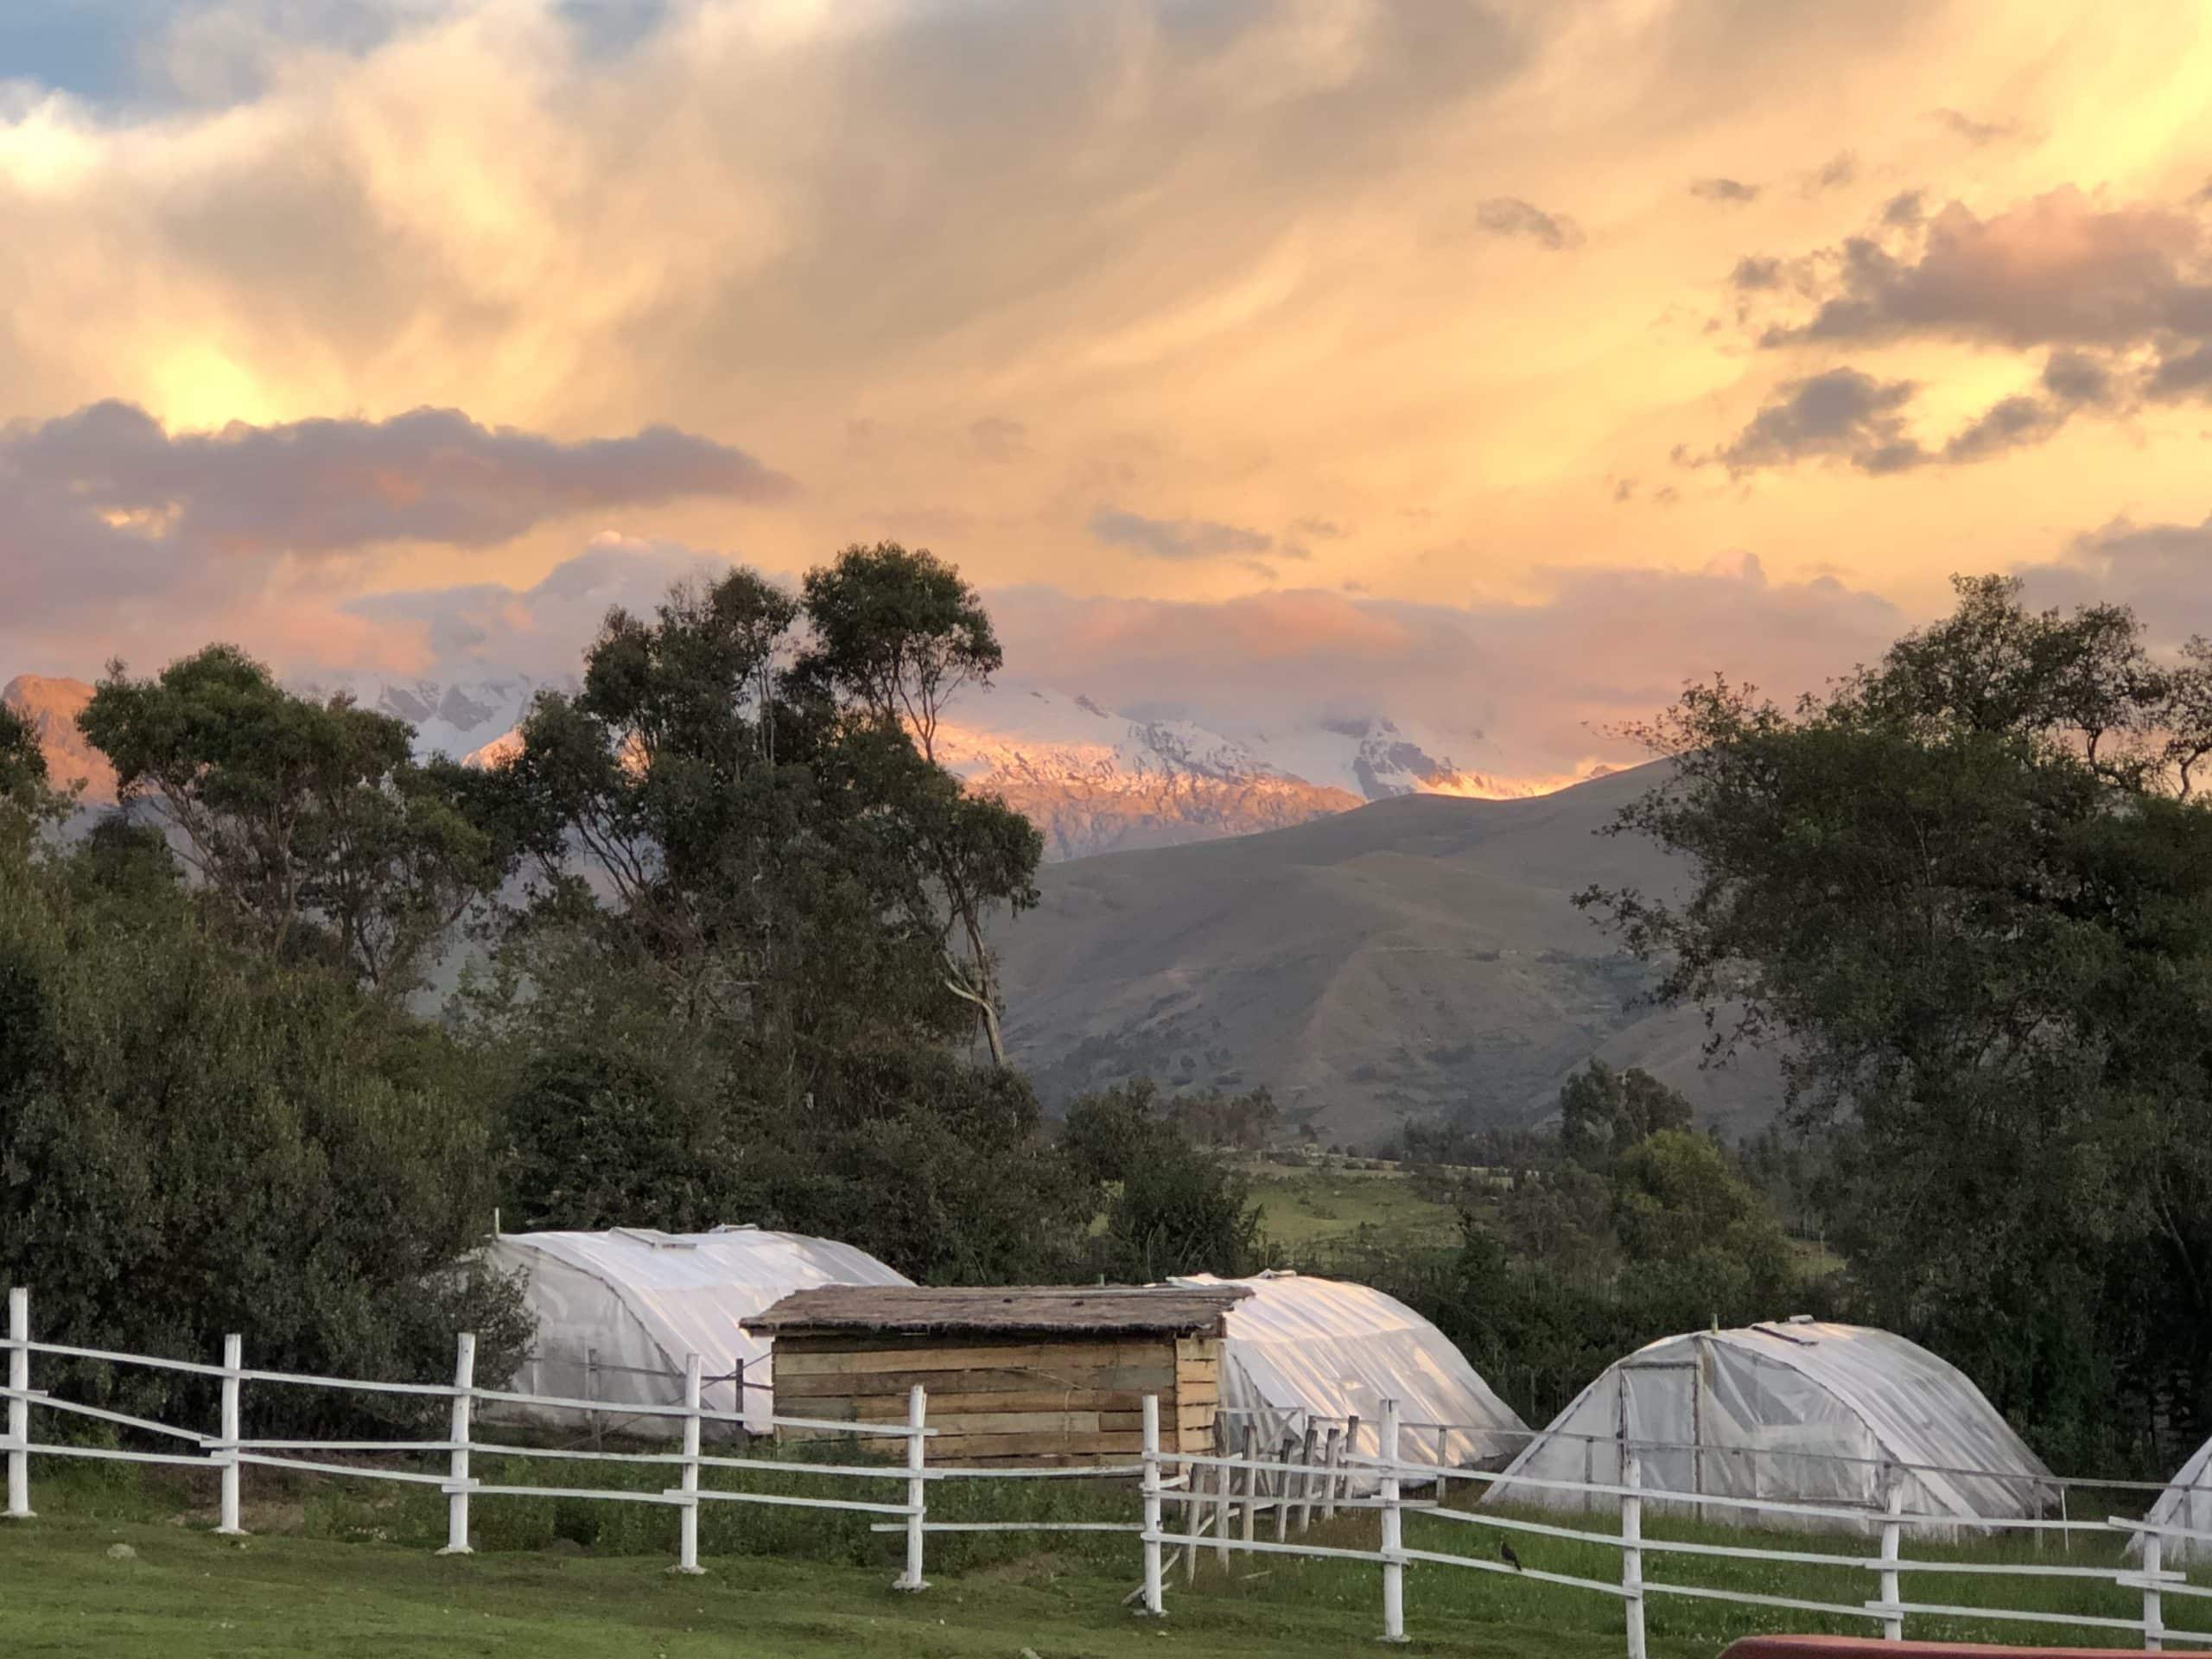 Farm to Table at The Lazy Dog Inn Mountain Lodge